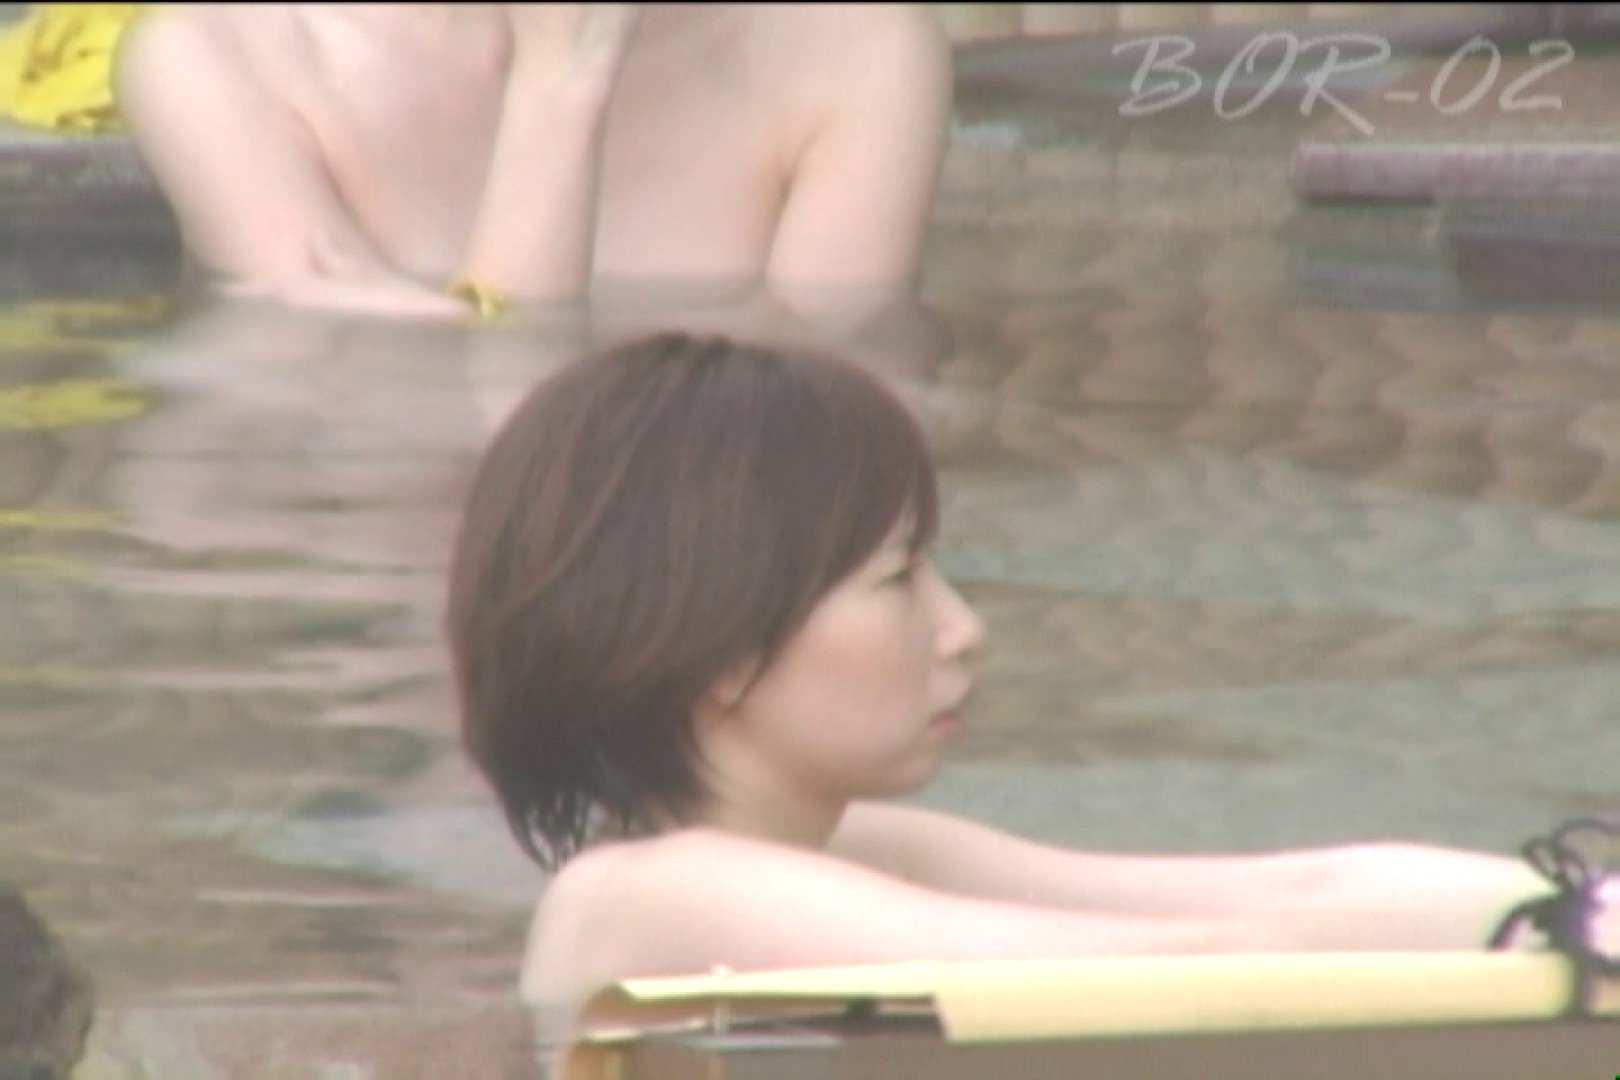 Aquaな露天風呂Vol.476 盗撮 濡れ場動画紹介 80画像 44